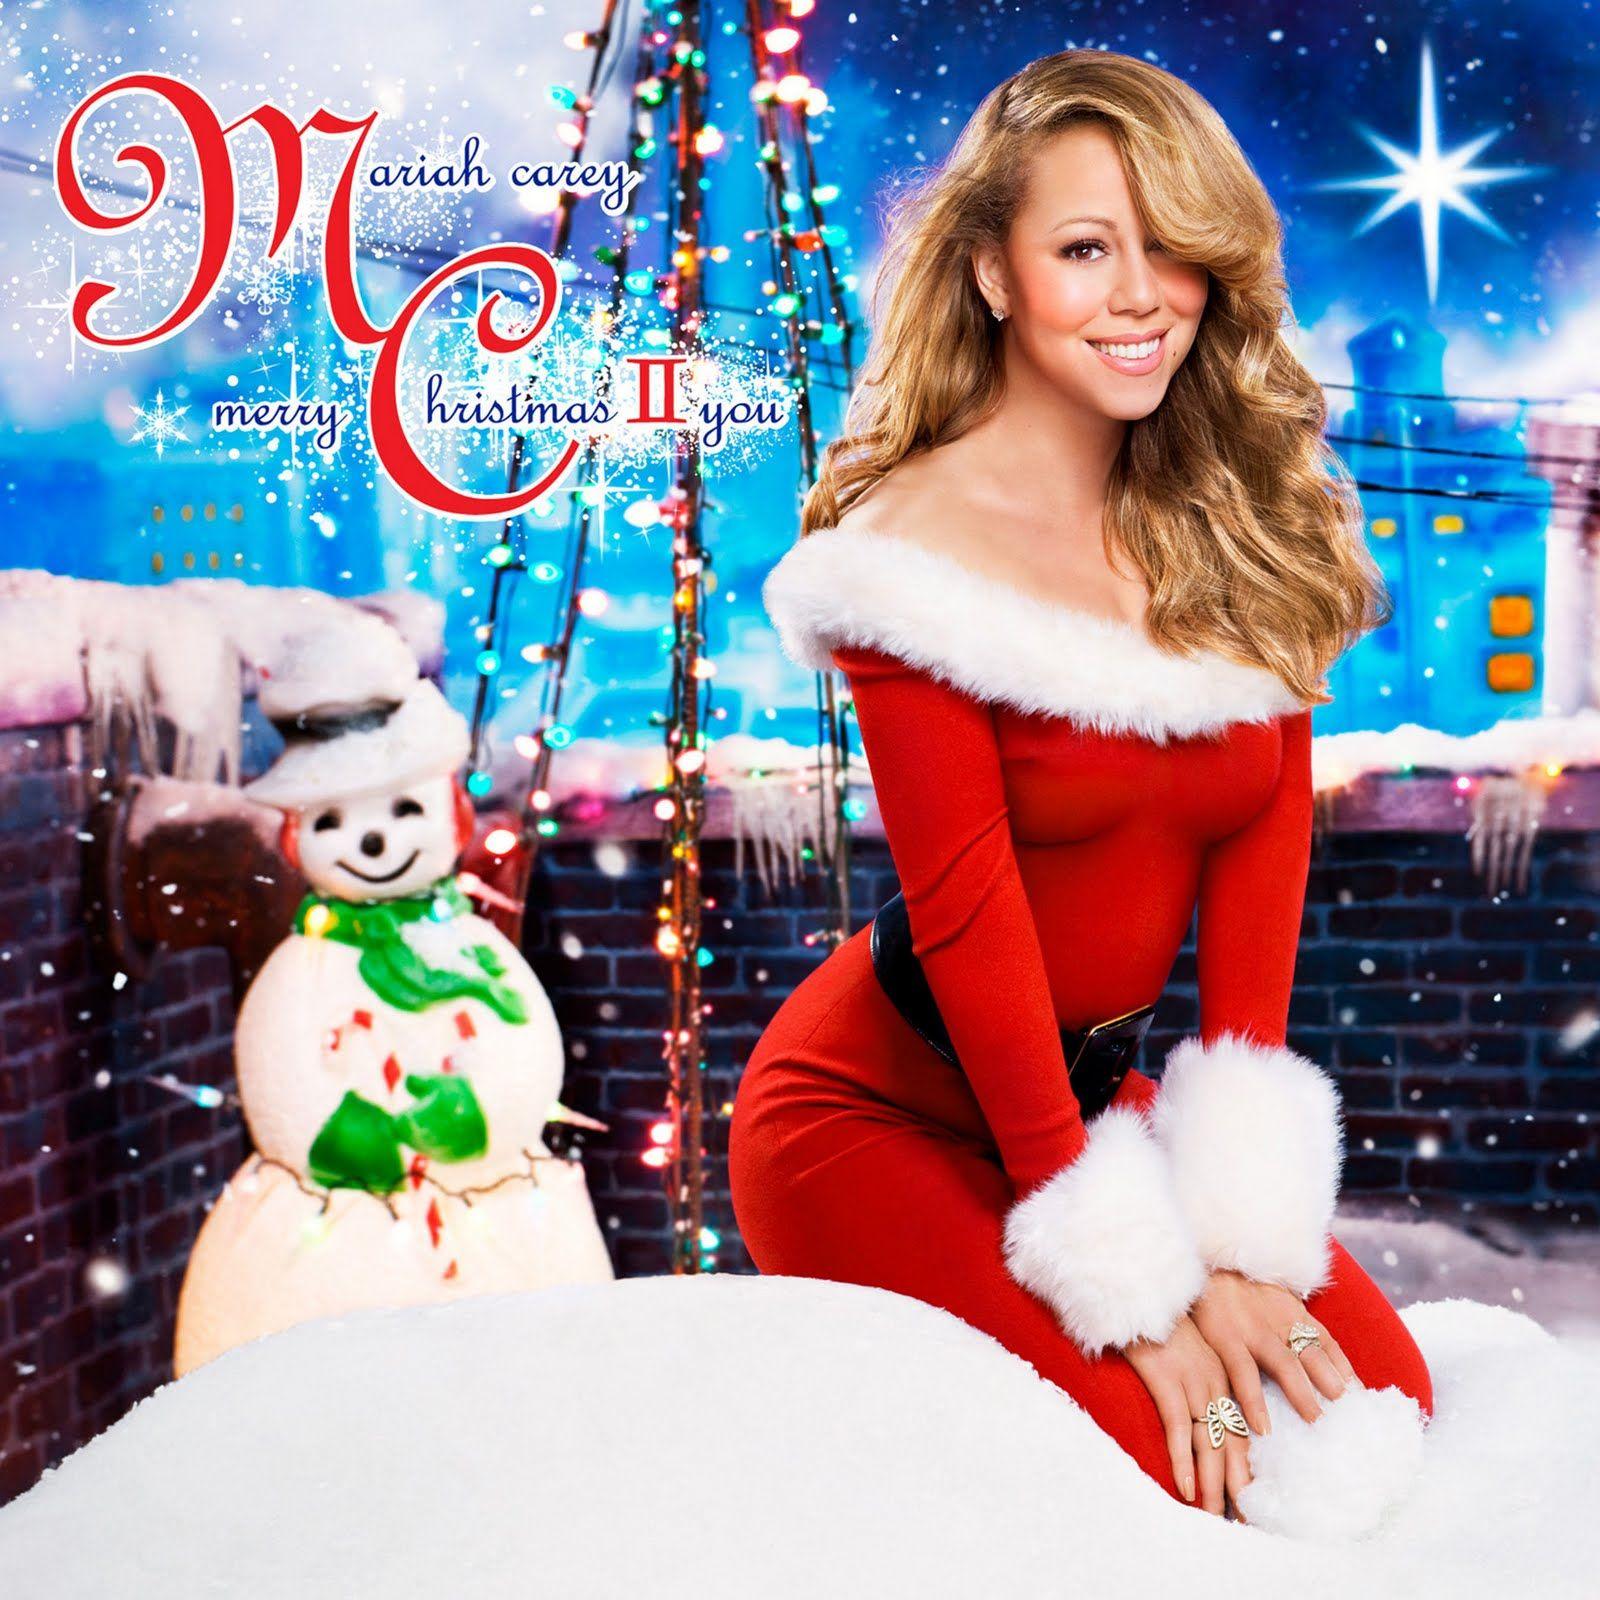 Mariah Carey Merry Christmas Ii You Mariah Carey Merry Christmas Mariah Carey Christmas Christmas Albums